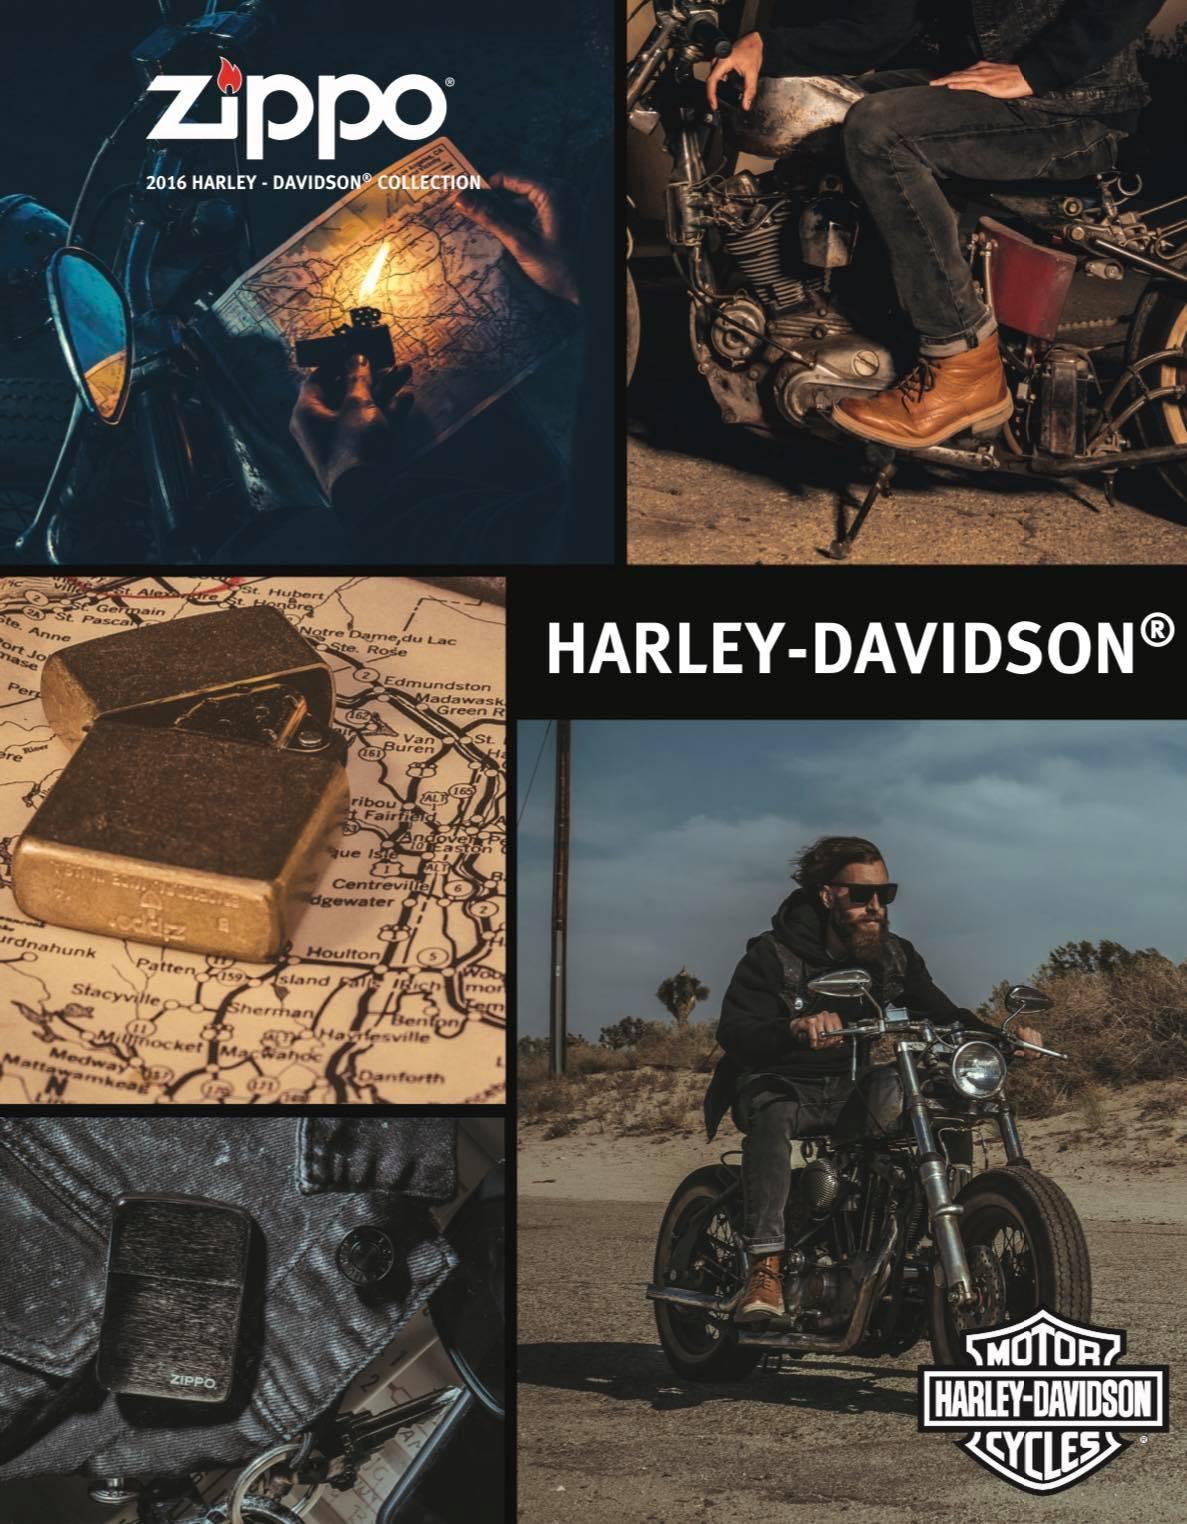 Zippo 2016 Harley Davidson Collection US